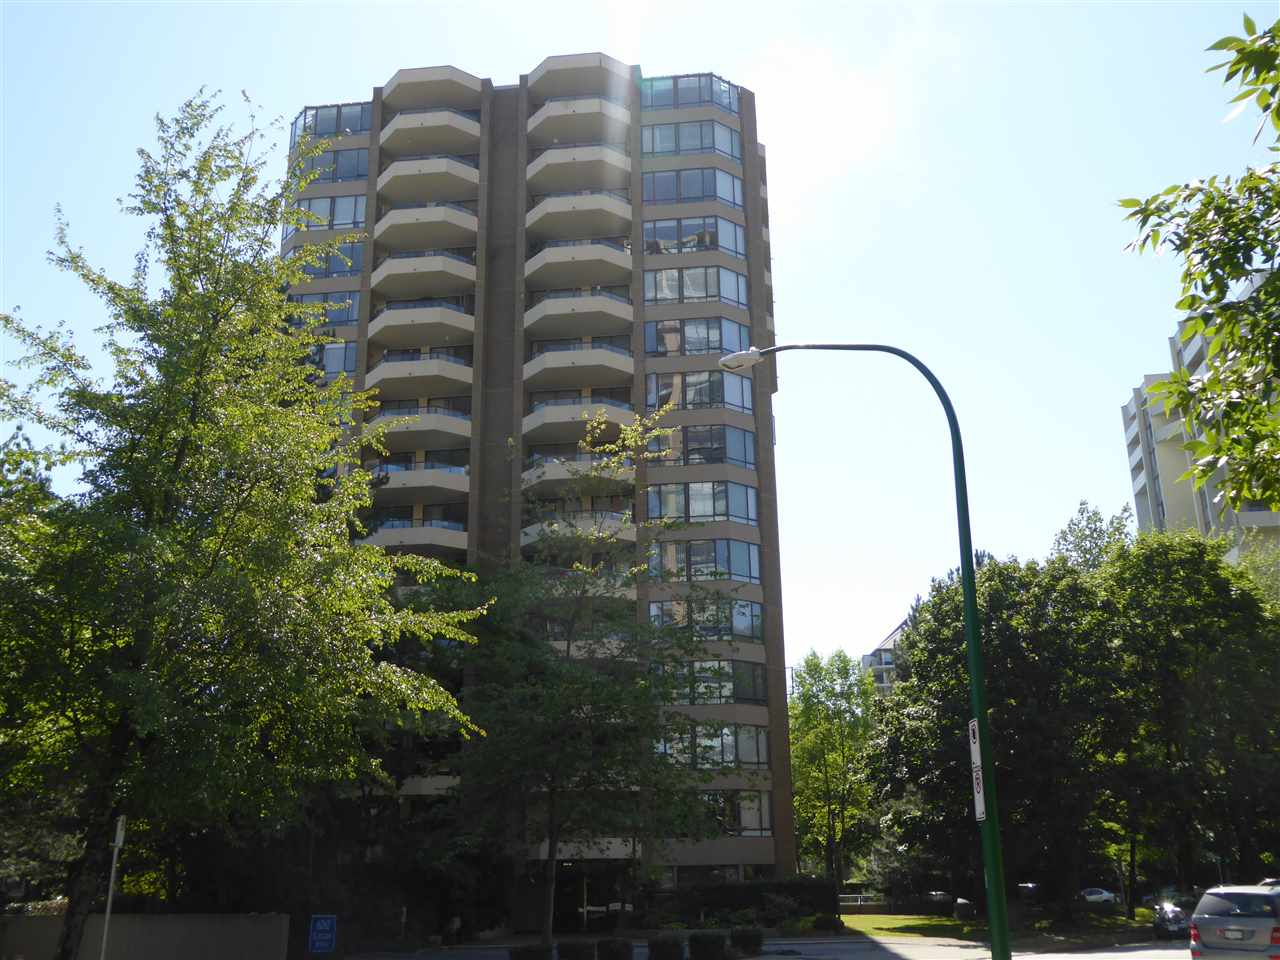 Condo Apartment at 1603 6282 KATHLEEN AVENUE, Unit 1603, Burnaby South, British Columbia. Image 1